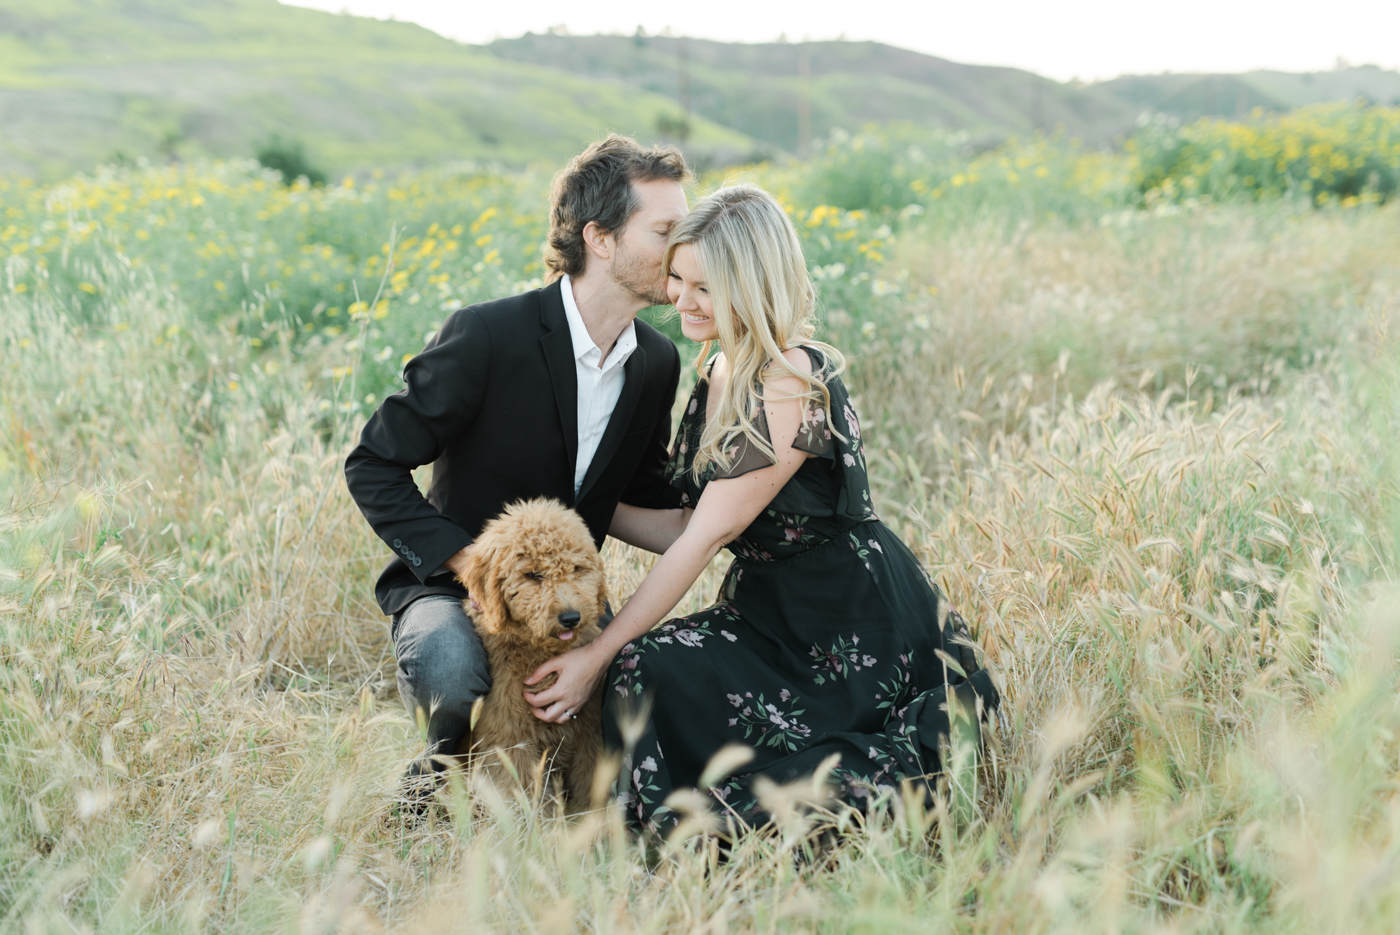 San_Juan_Capistrano_Goldendoodle_family_portrait_session_los_angeles_wedding_photographer-25.jpg